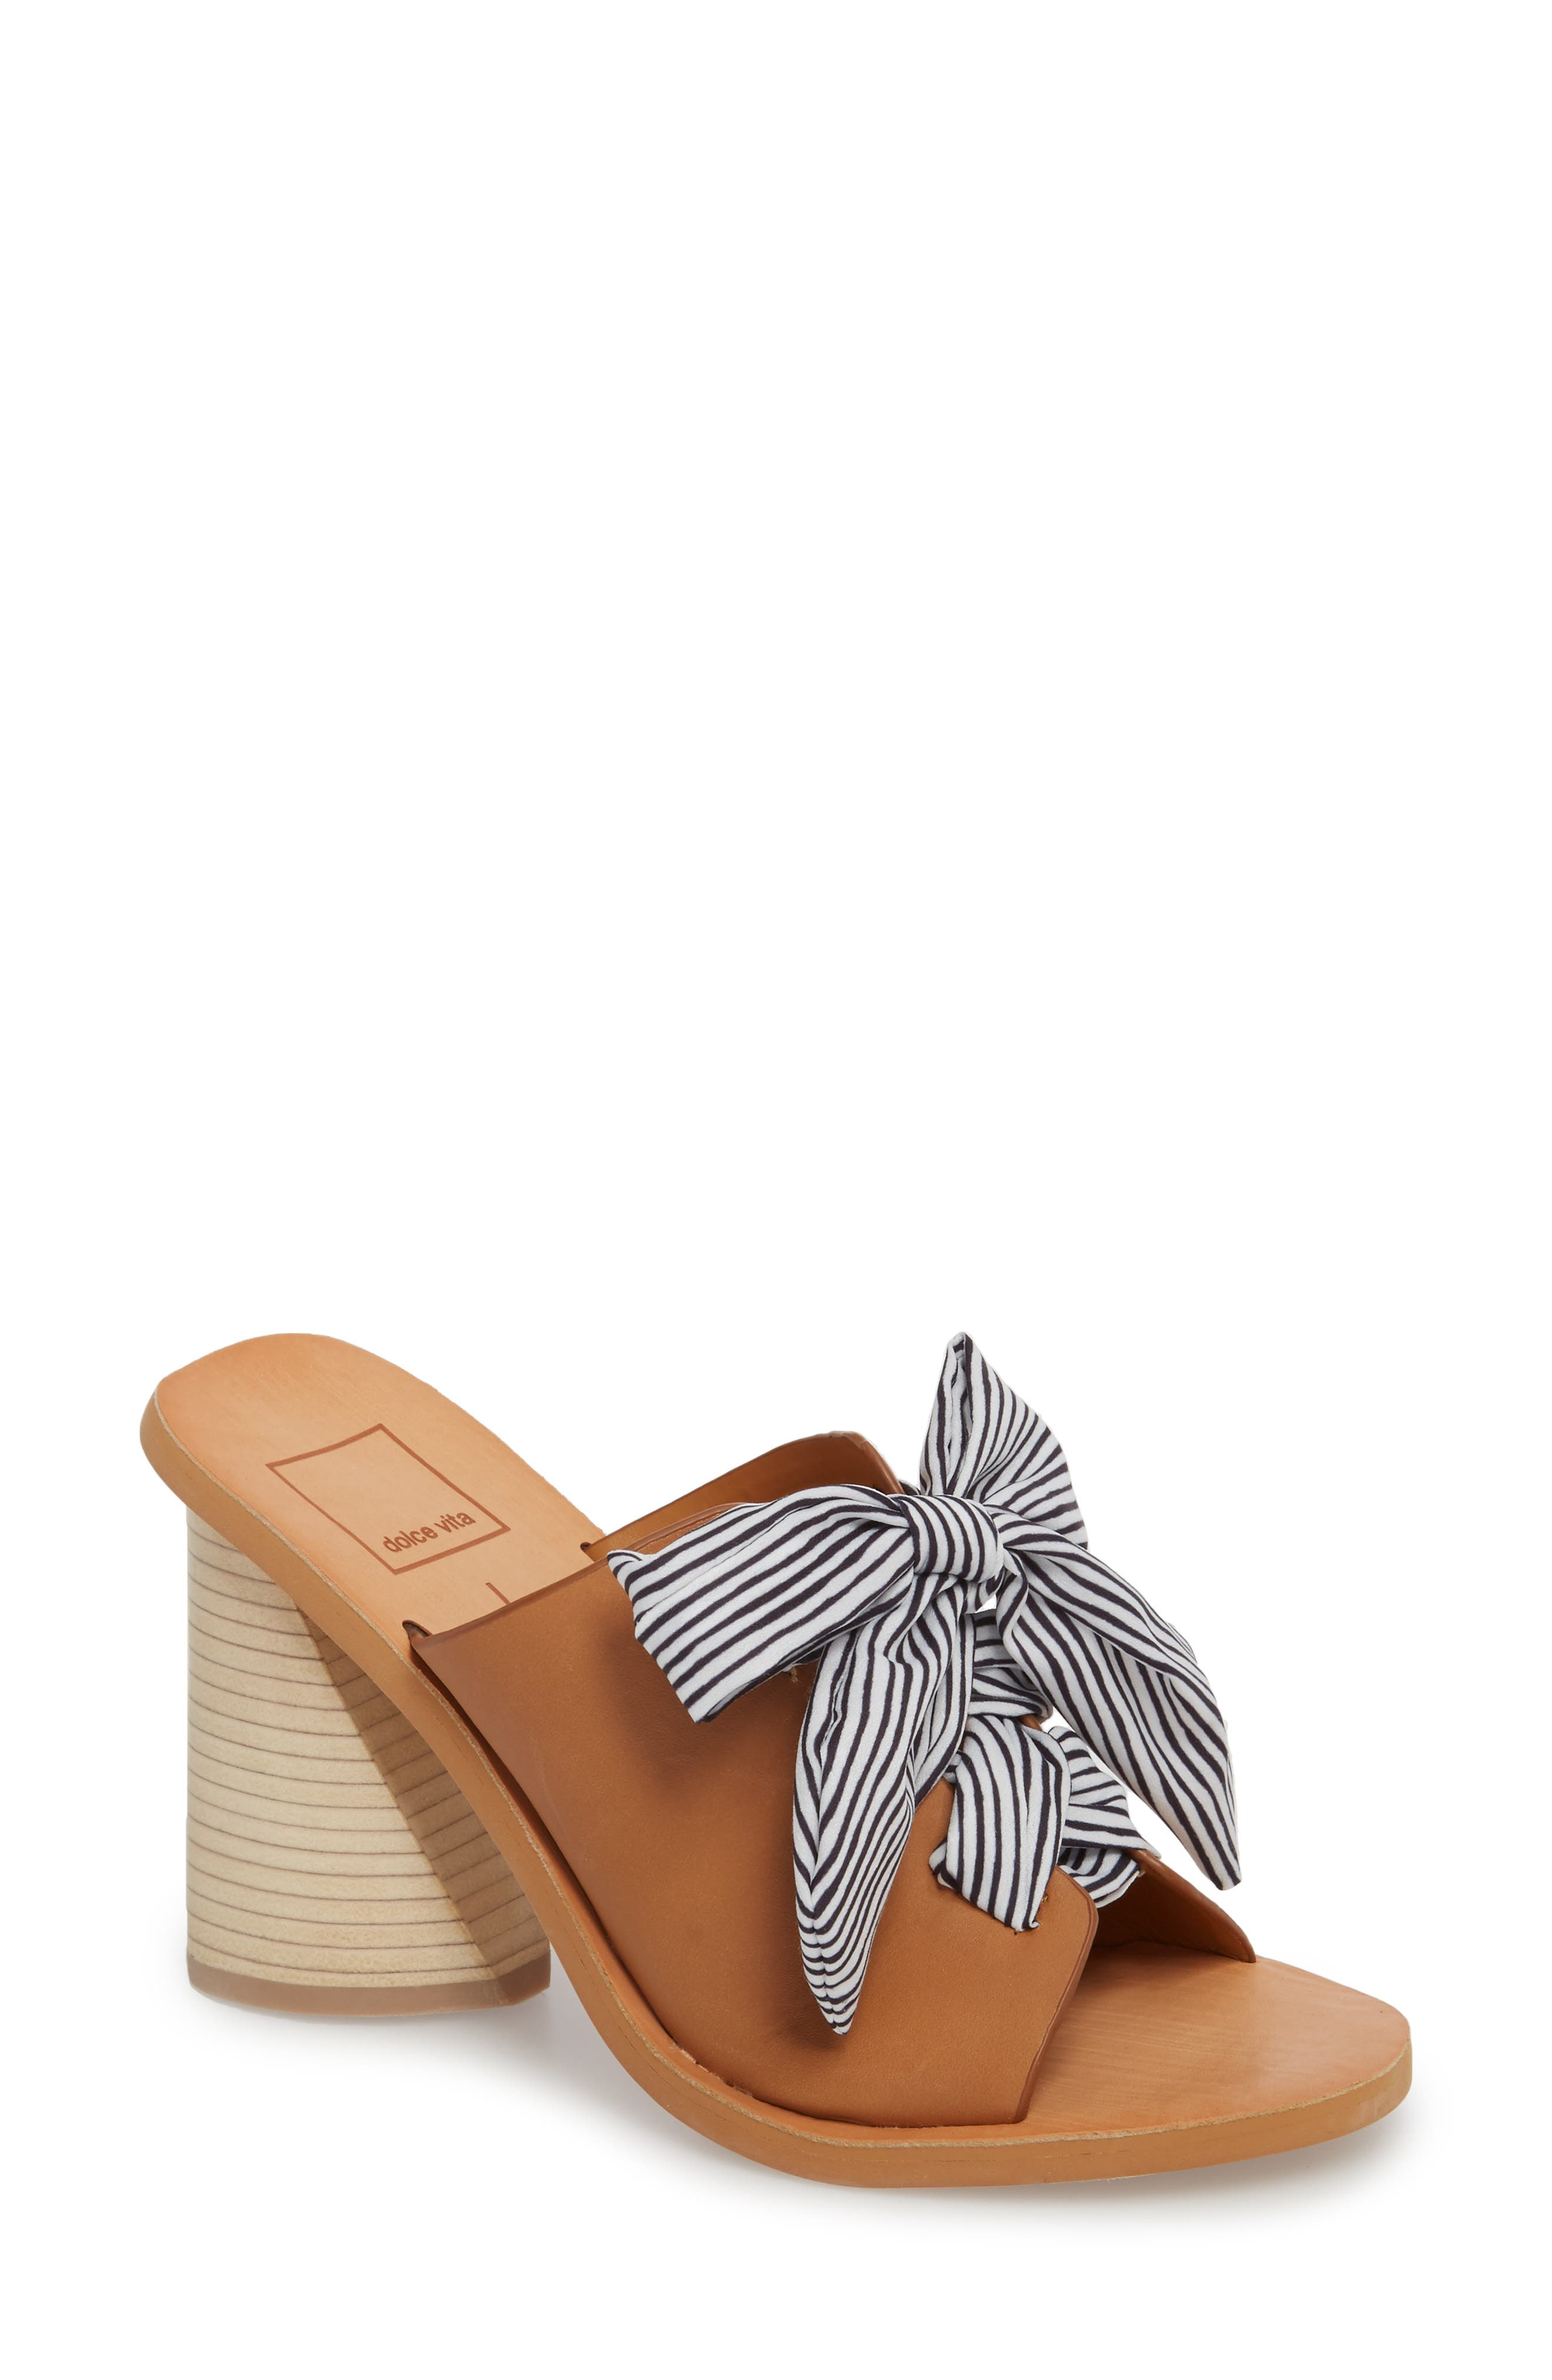 Amber Lace-Up Sandal,                             Main thumbnail 1, color,                             Caramel Leather